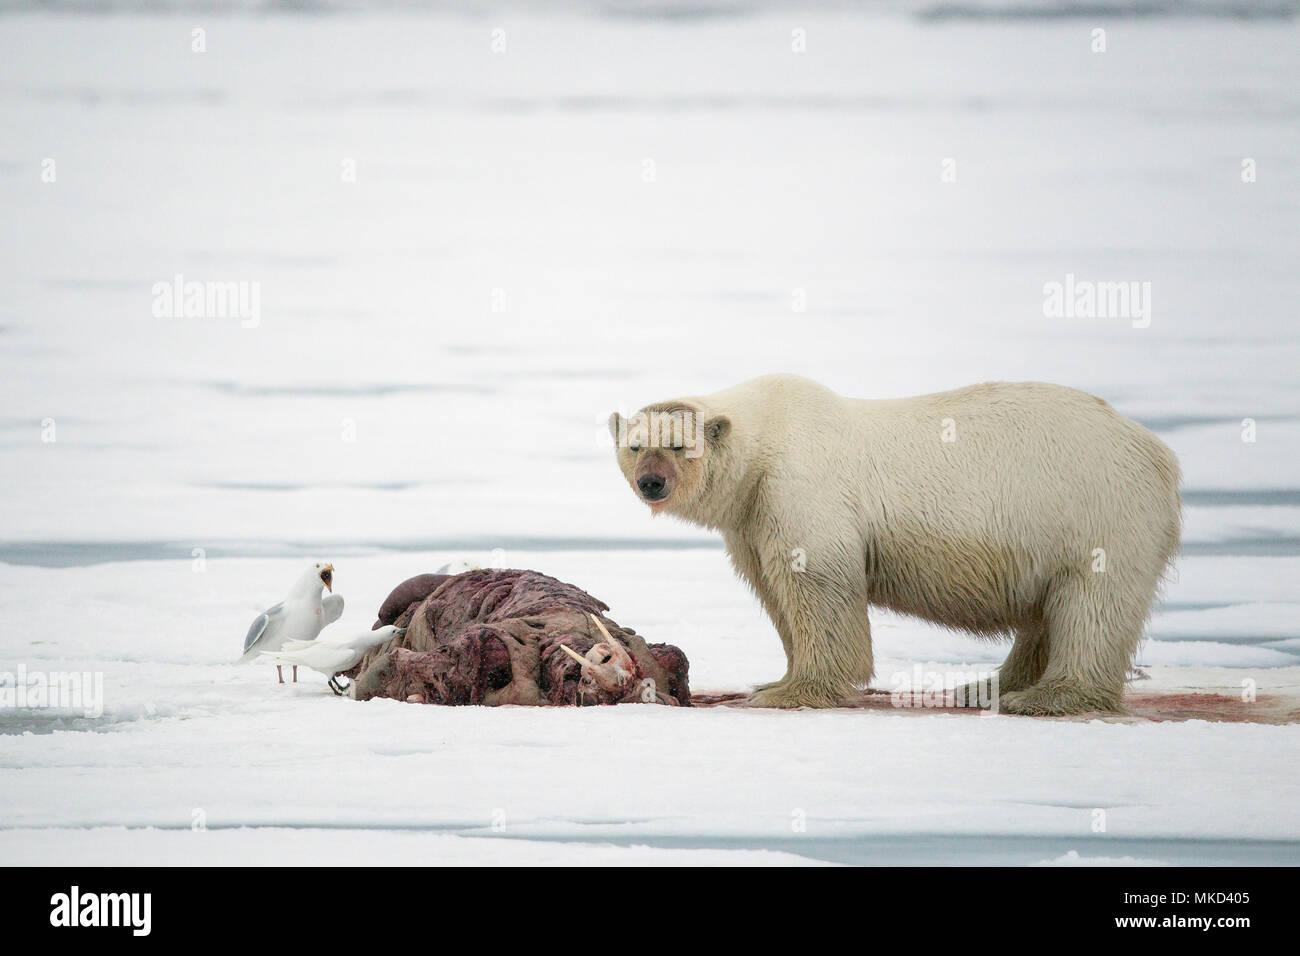 Polar bear (Ursus maritimus) eating a walrus (Odobenus rosmarus), on the ice, Spitsbergen, Svalbard, Norwegian archipelago, Norway, Arctic Ocean Stock Photo